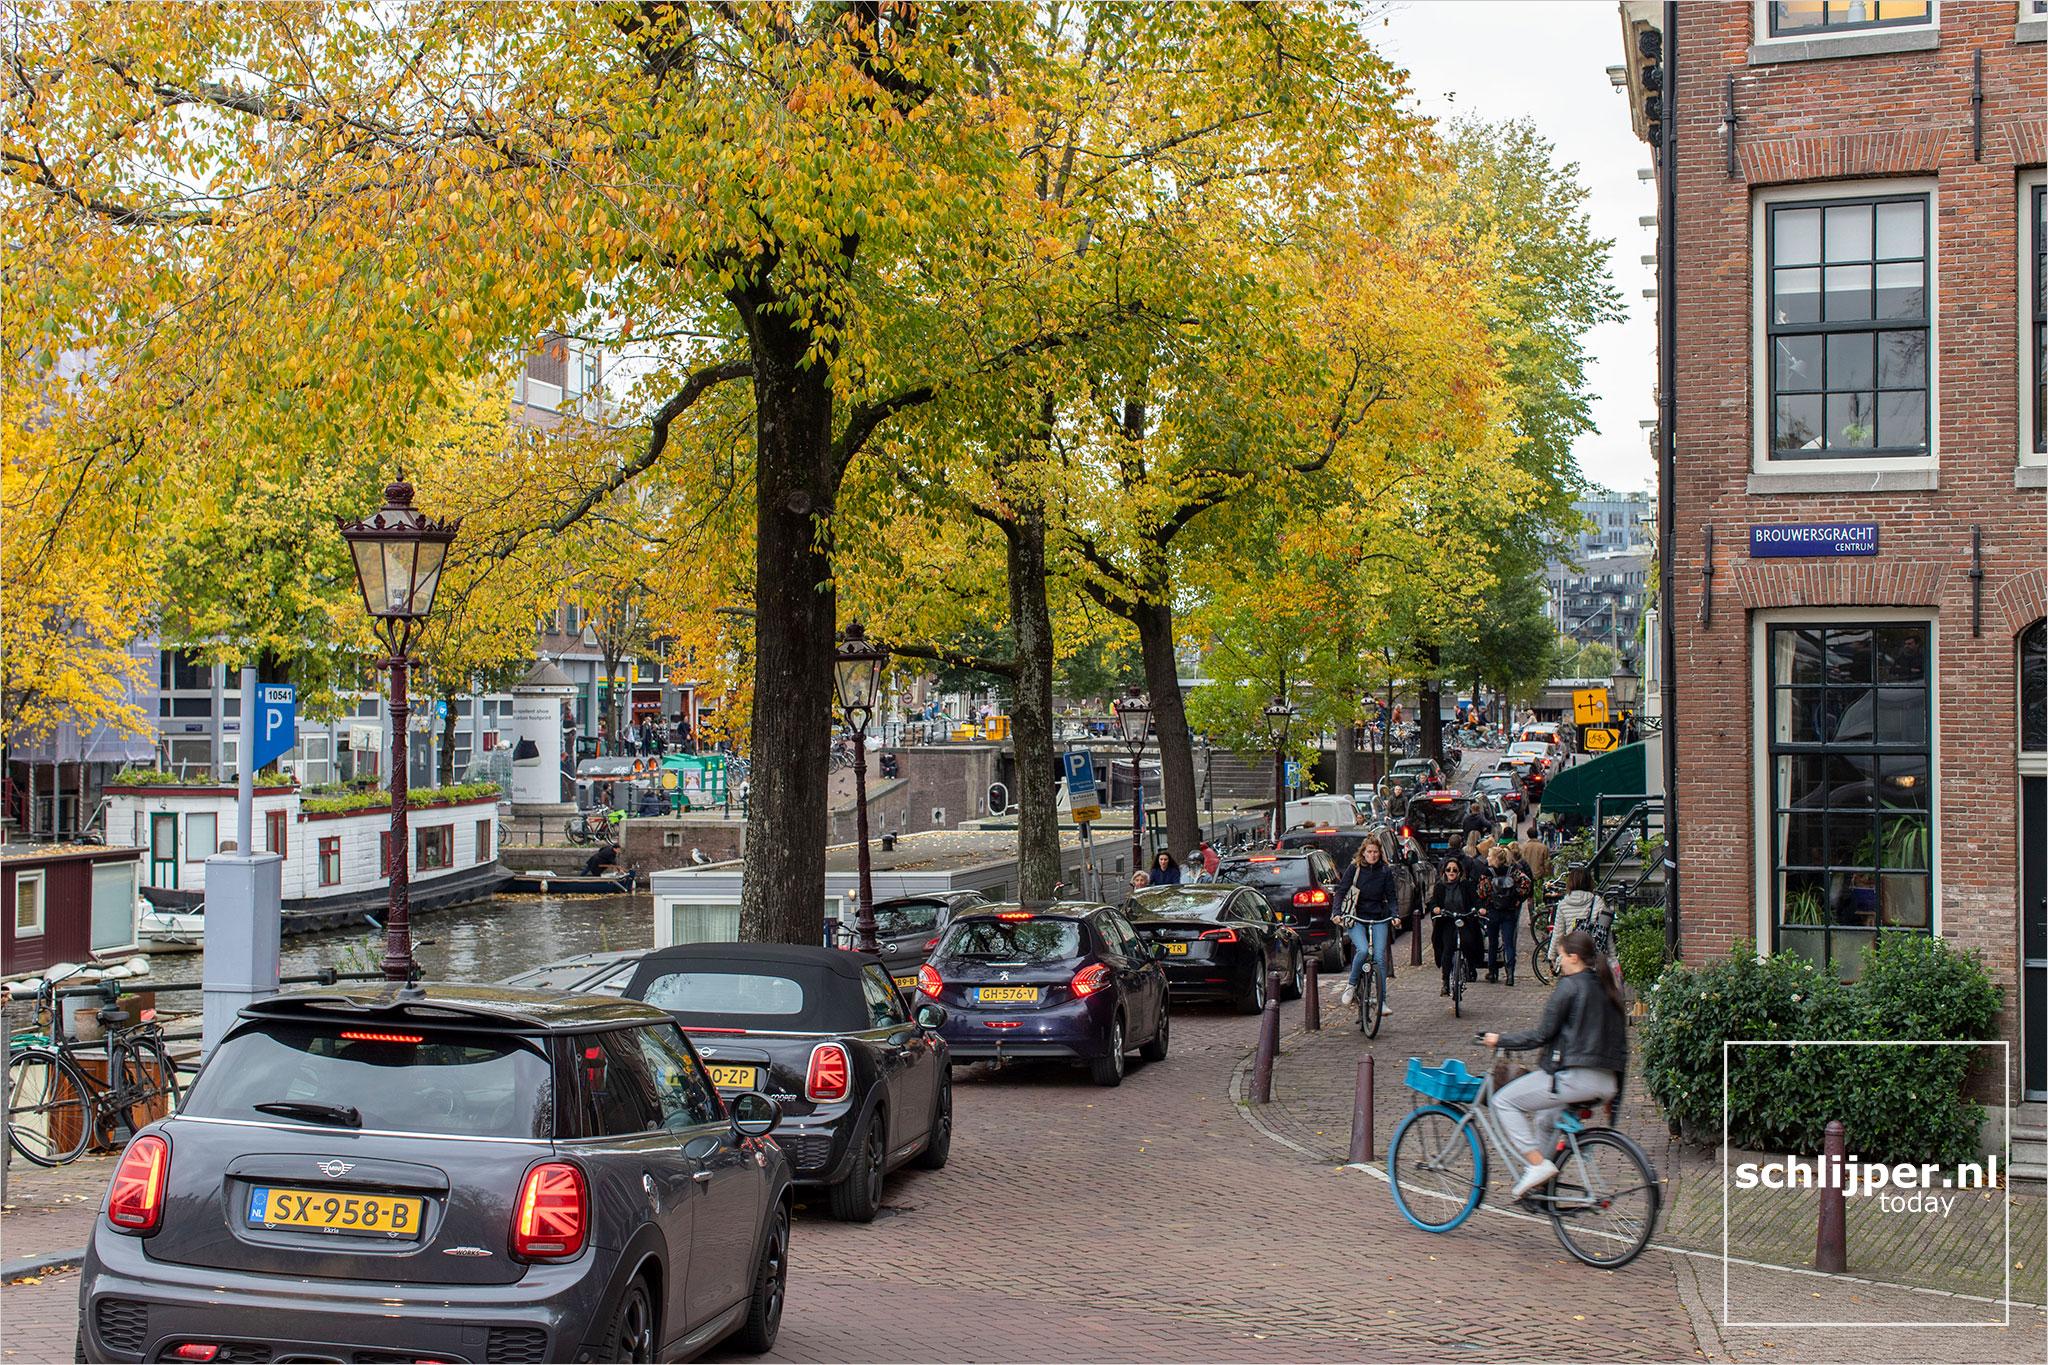 Nederland, Amsterdam, 24 oktober 2020